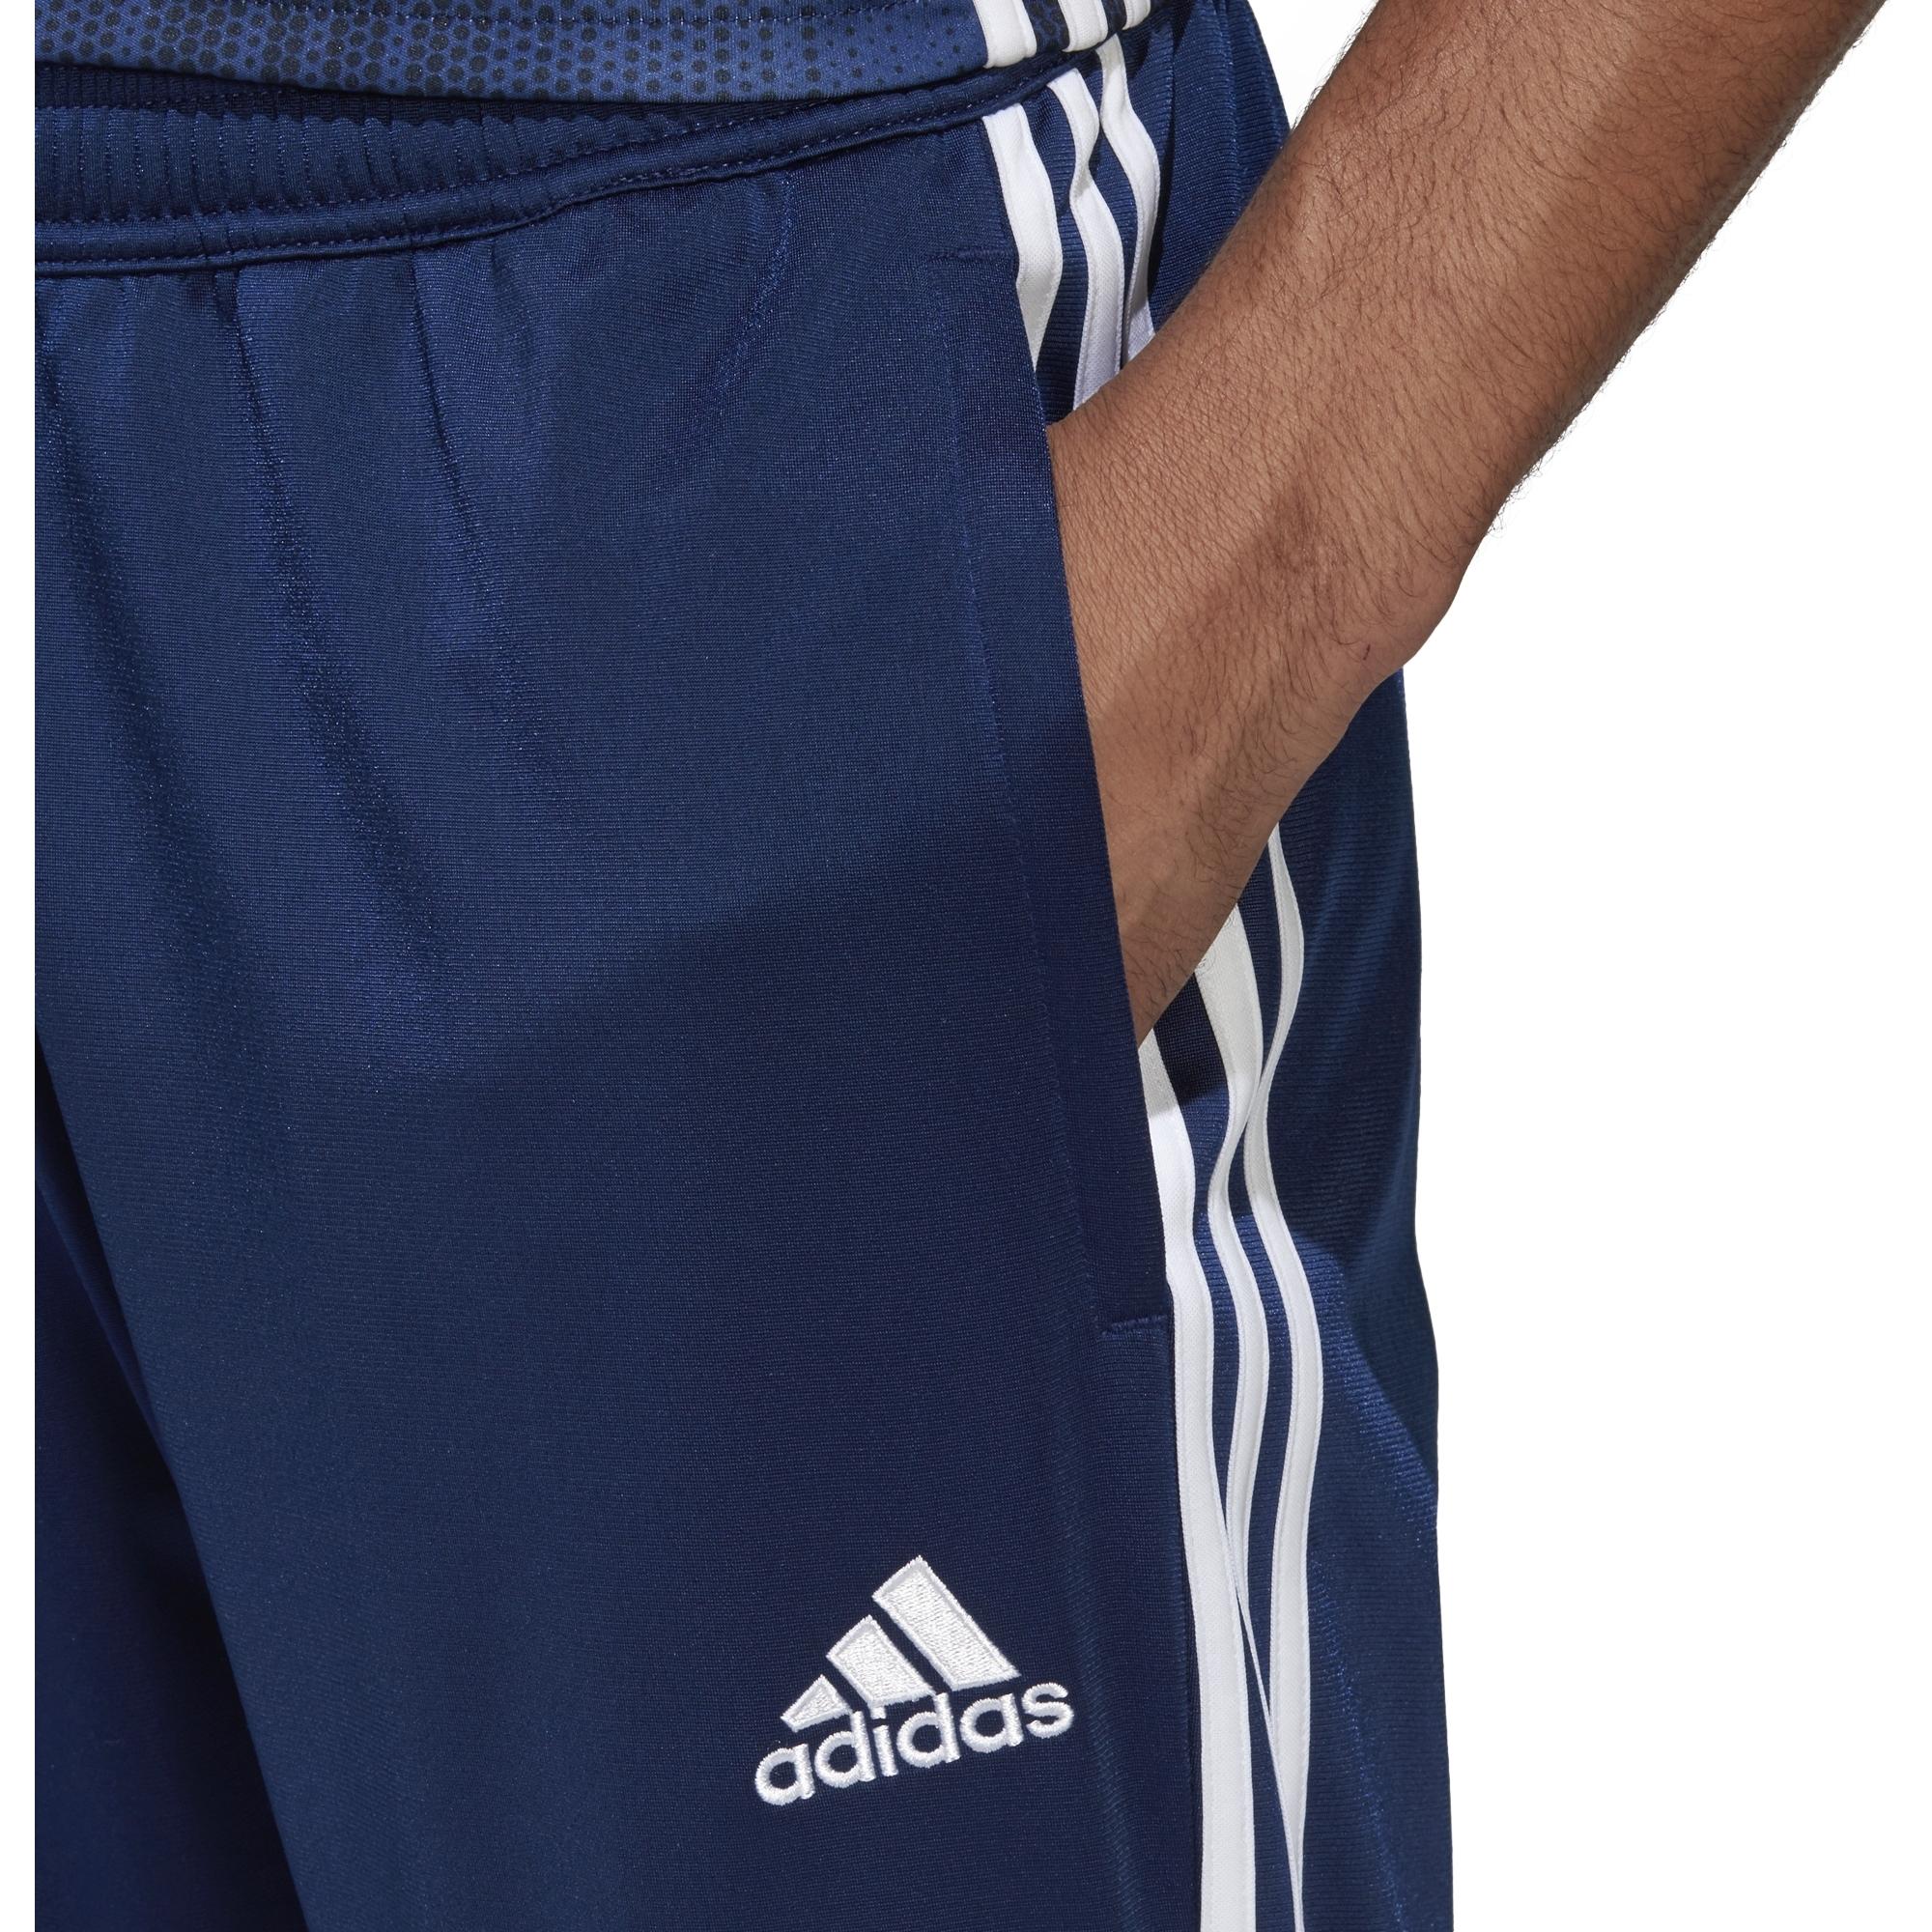 Adidas Tiro 19 Polyester Hose | Online kaufen bei ZATENO